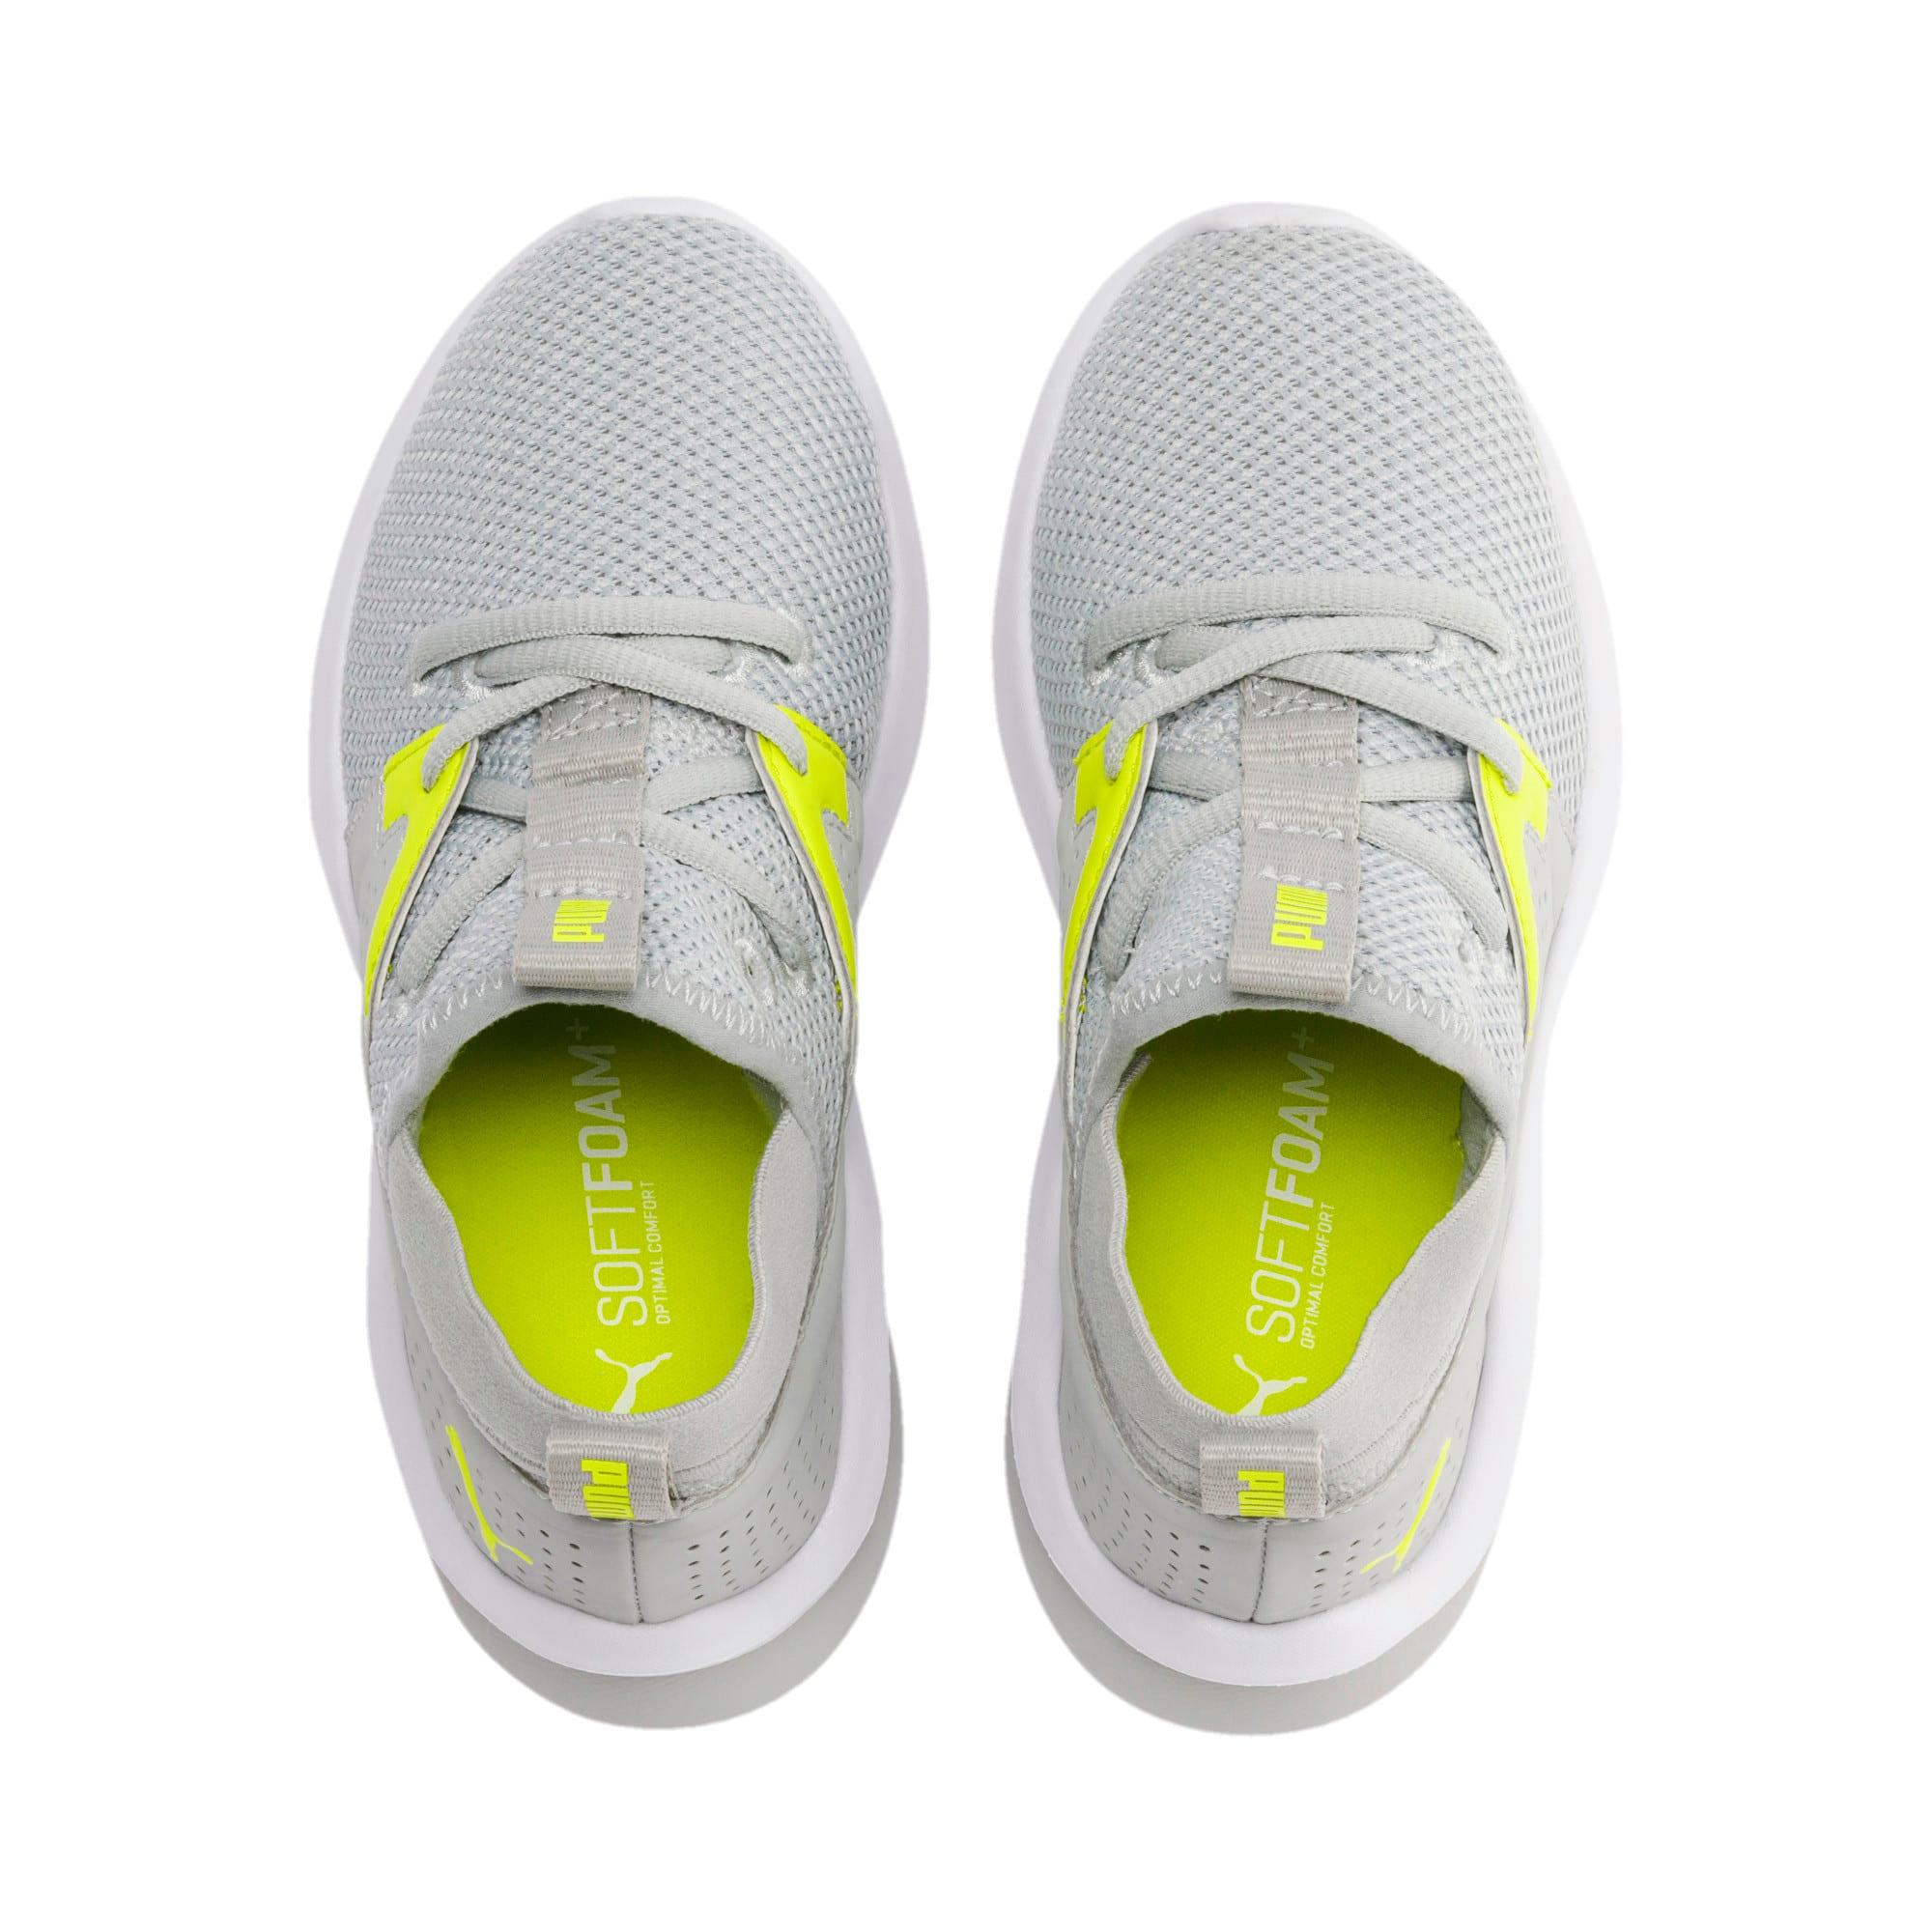 Thumbnail 6 of Emergence Little Kids' Shoes, High Rise-Nrgy Yellow, medium